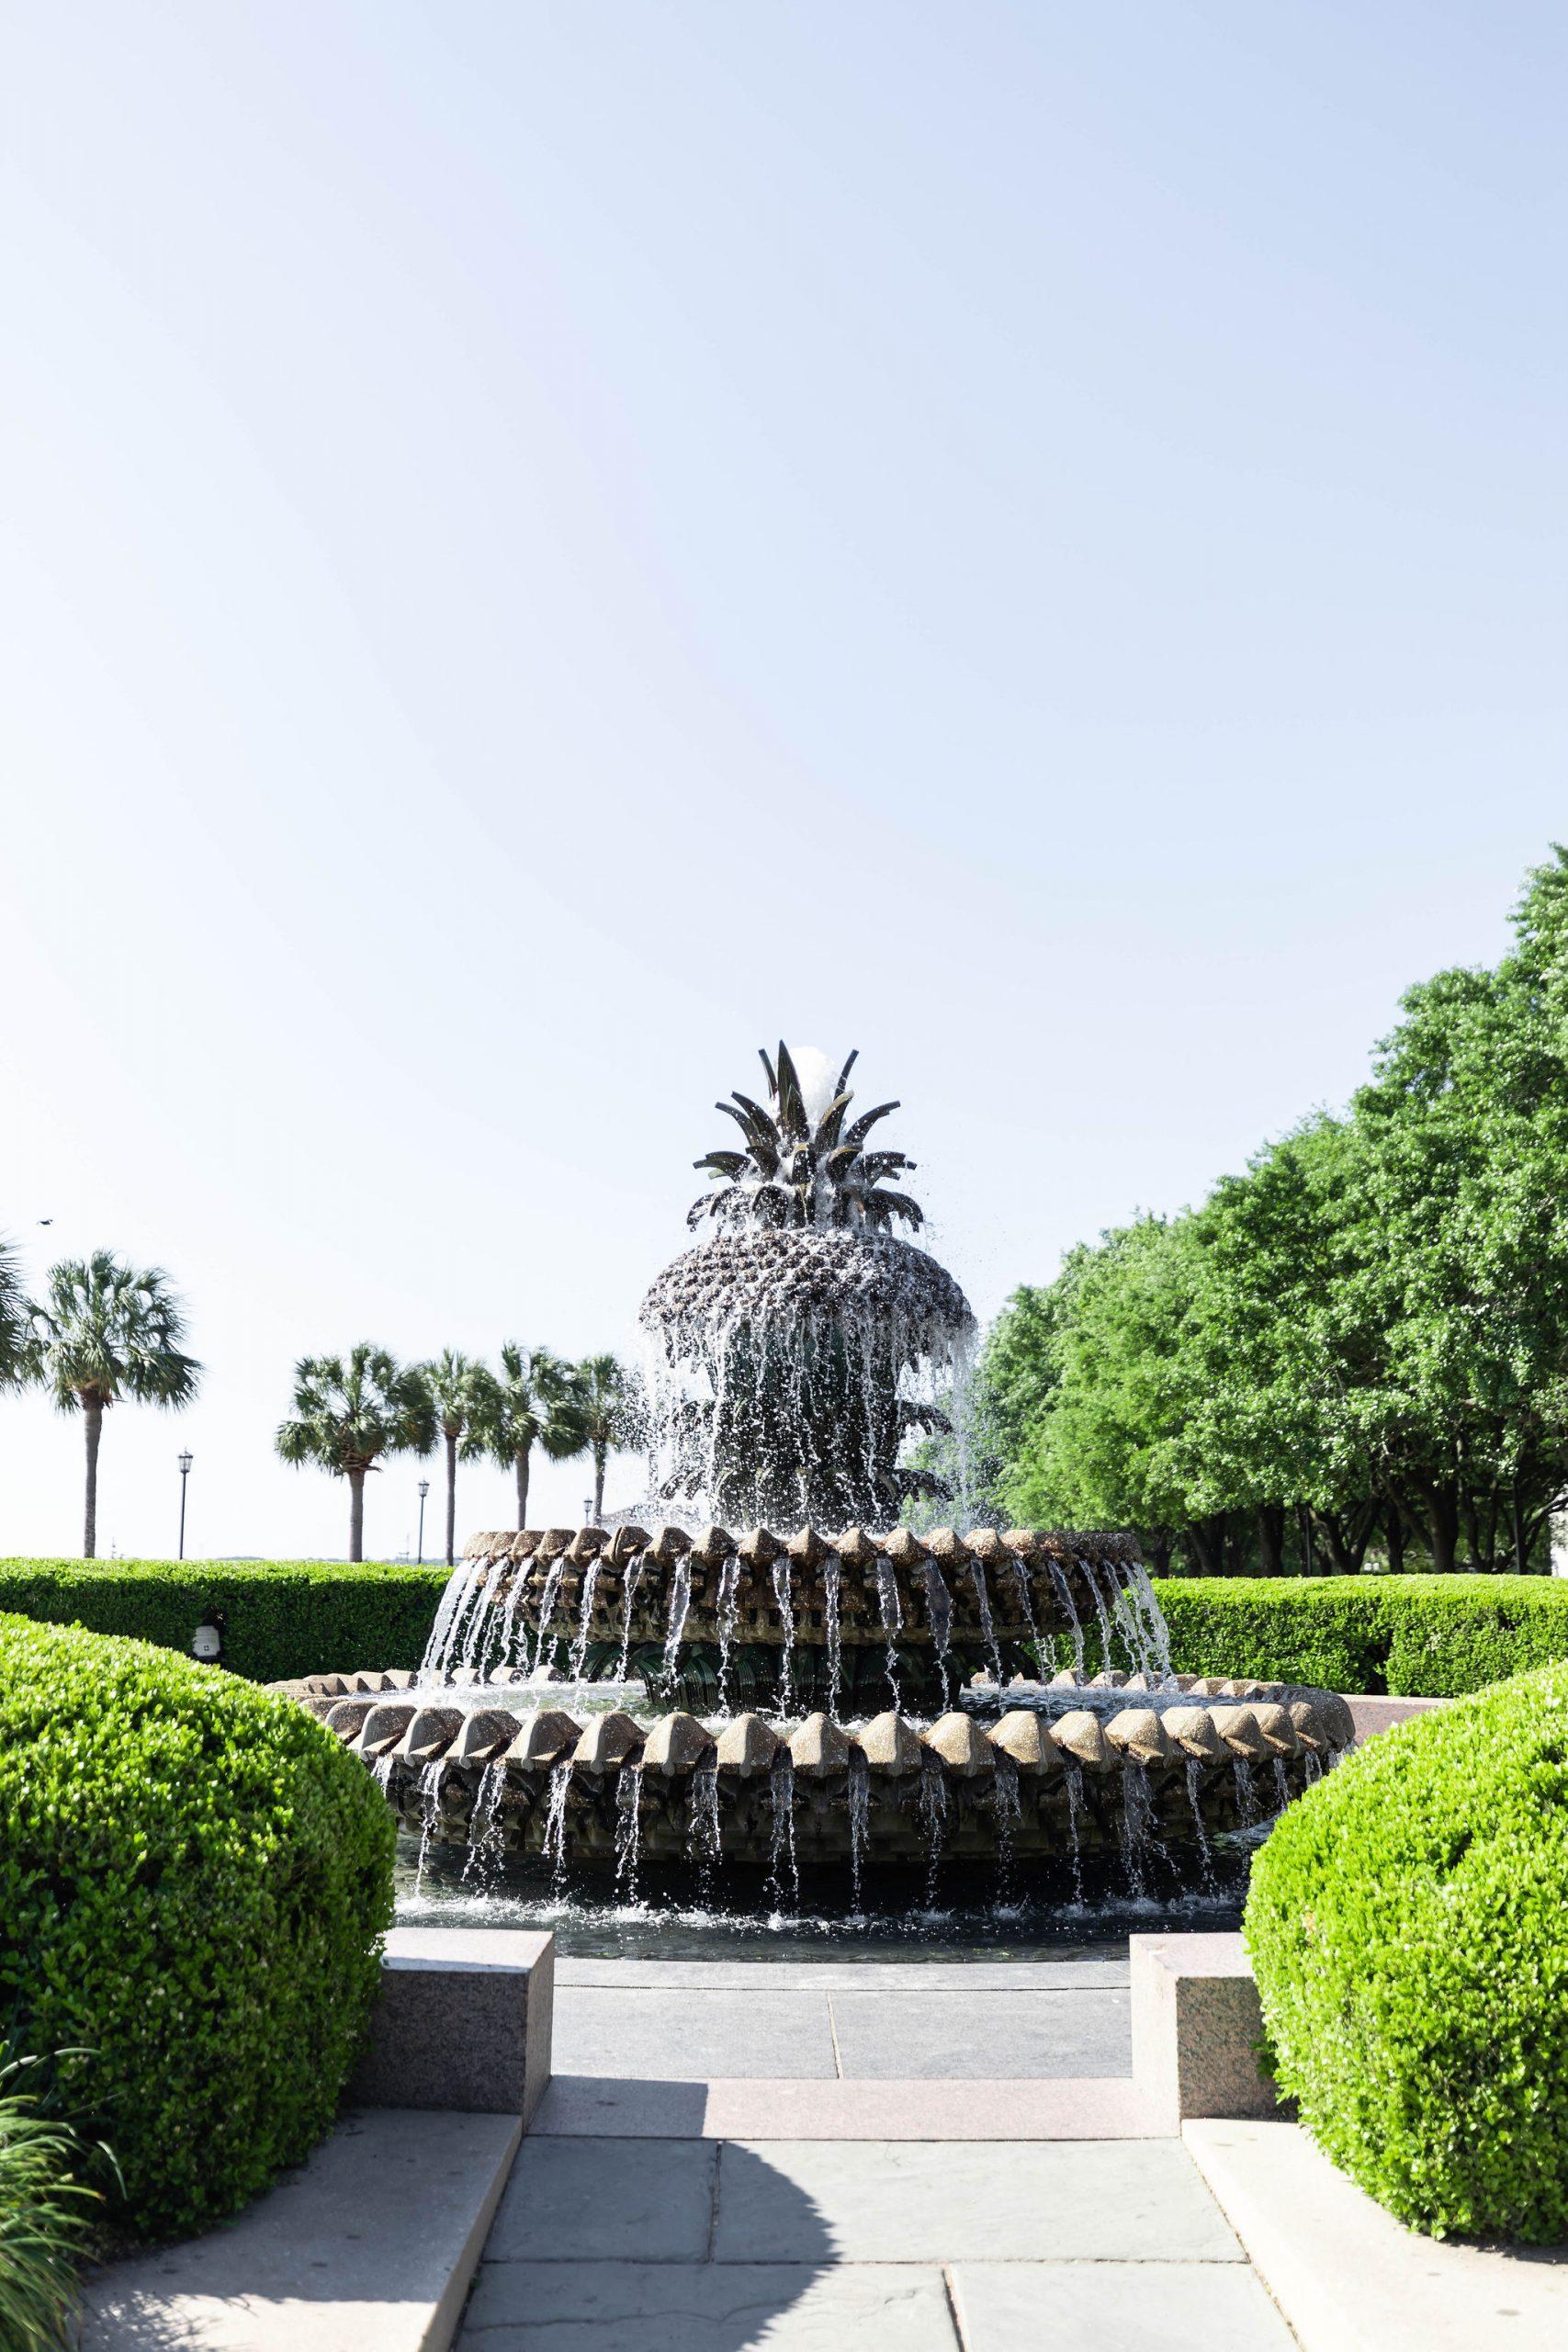 Charleston Luxury Travel Guide by Photographer Annie Fairfax South Carolina Vacation Ideas and Honeymoon Inspiration